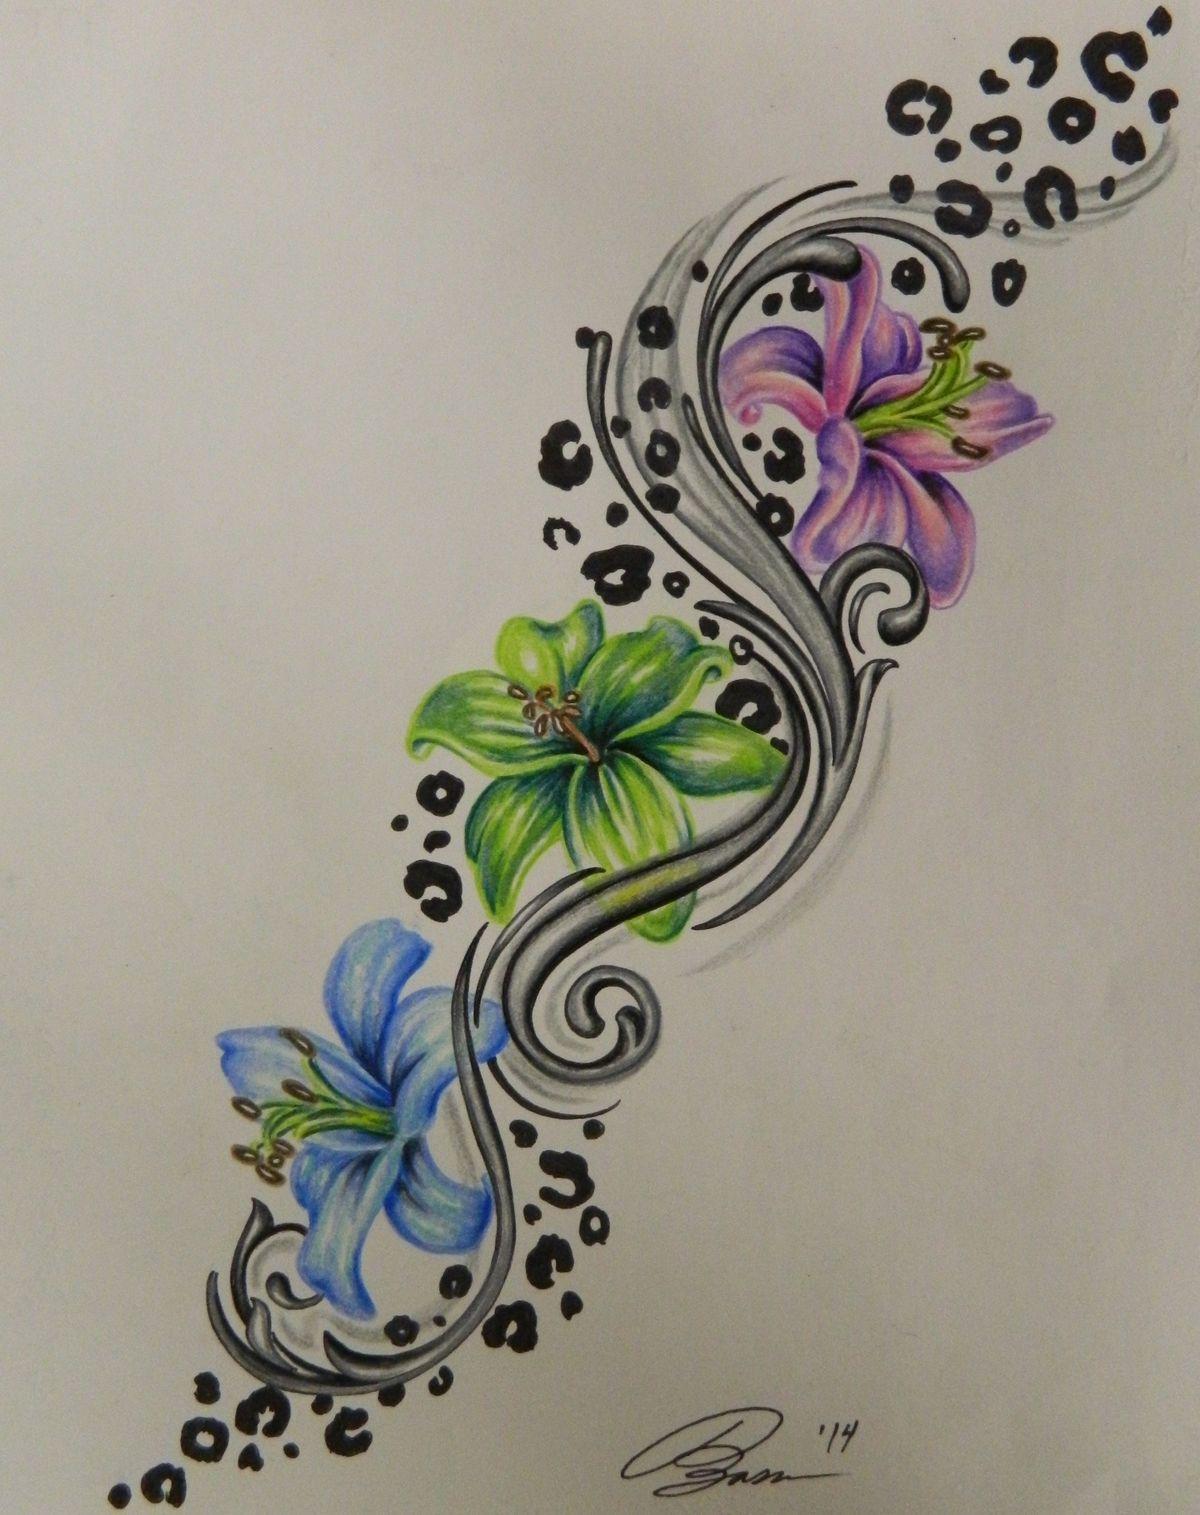 Ebefbdbcfacg tattoos